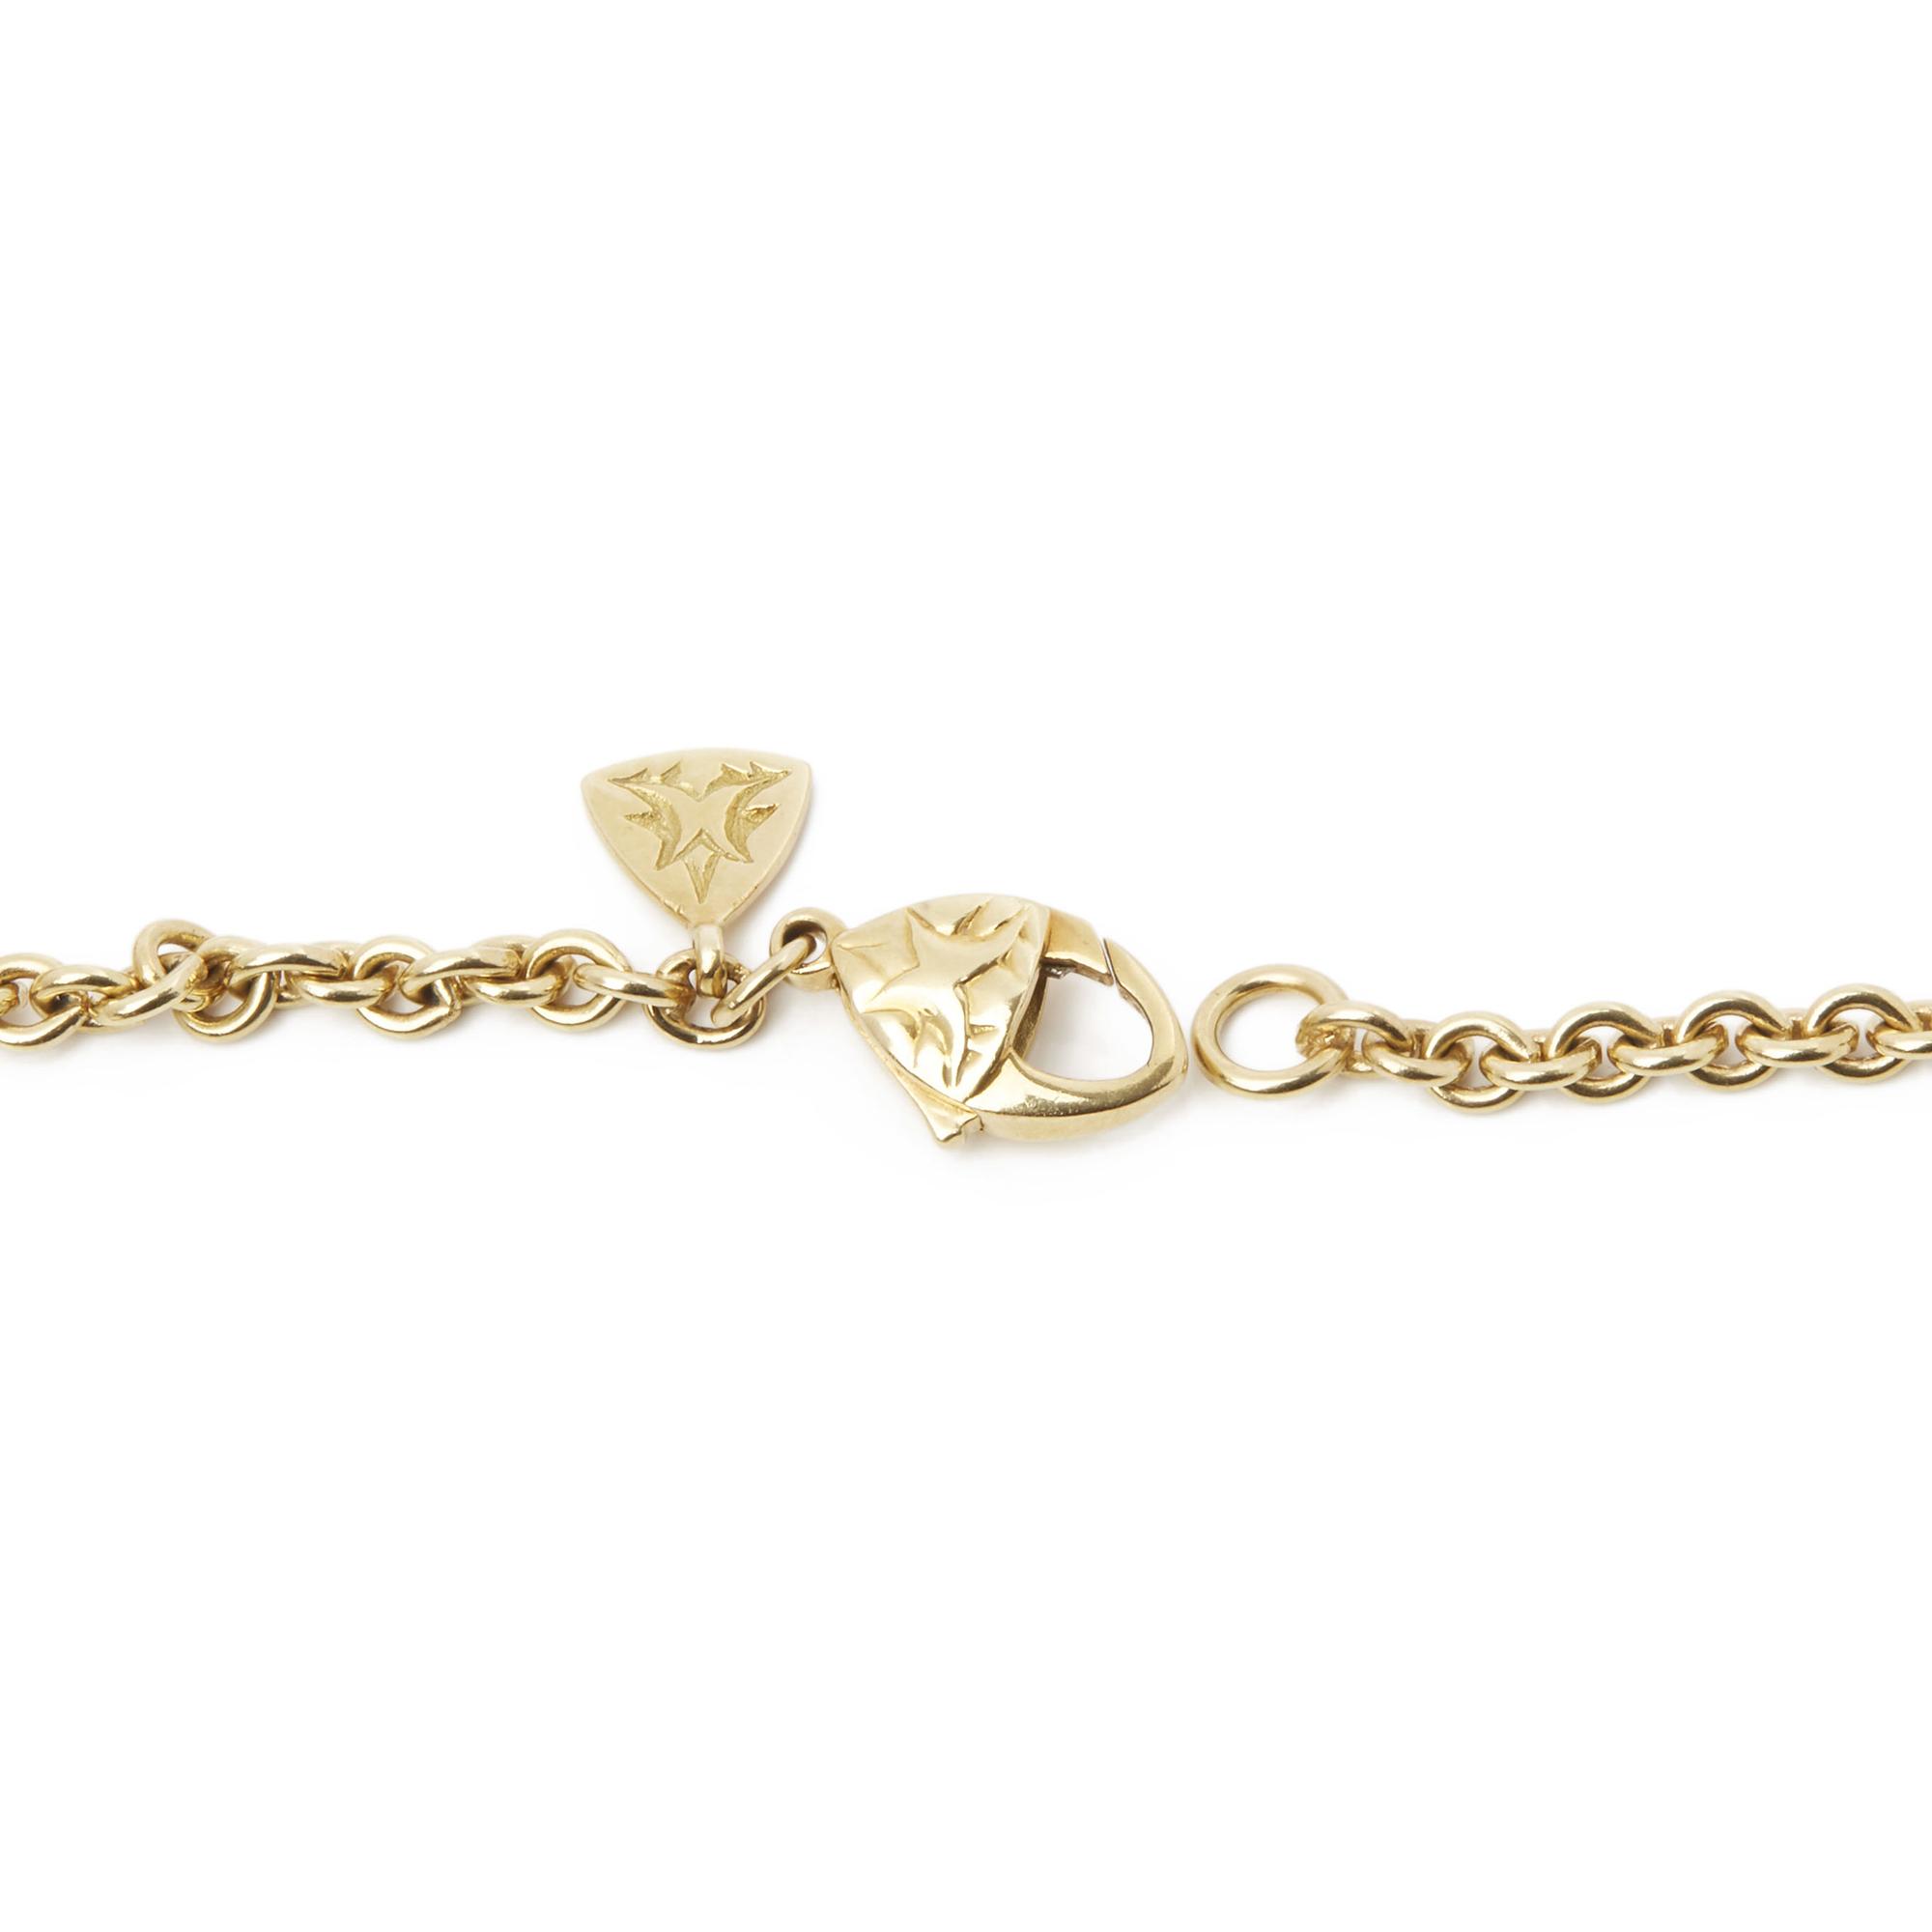 Stephen Webster 18k Yellow Gold Citrine & Diamond Crystal Haze Pendant Necklace - Image 6 of 8